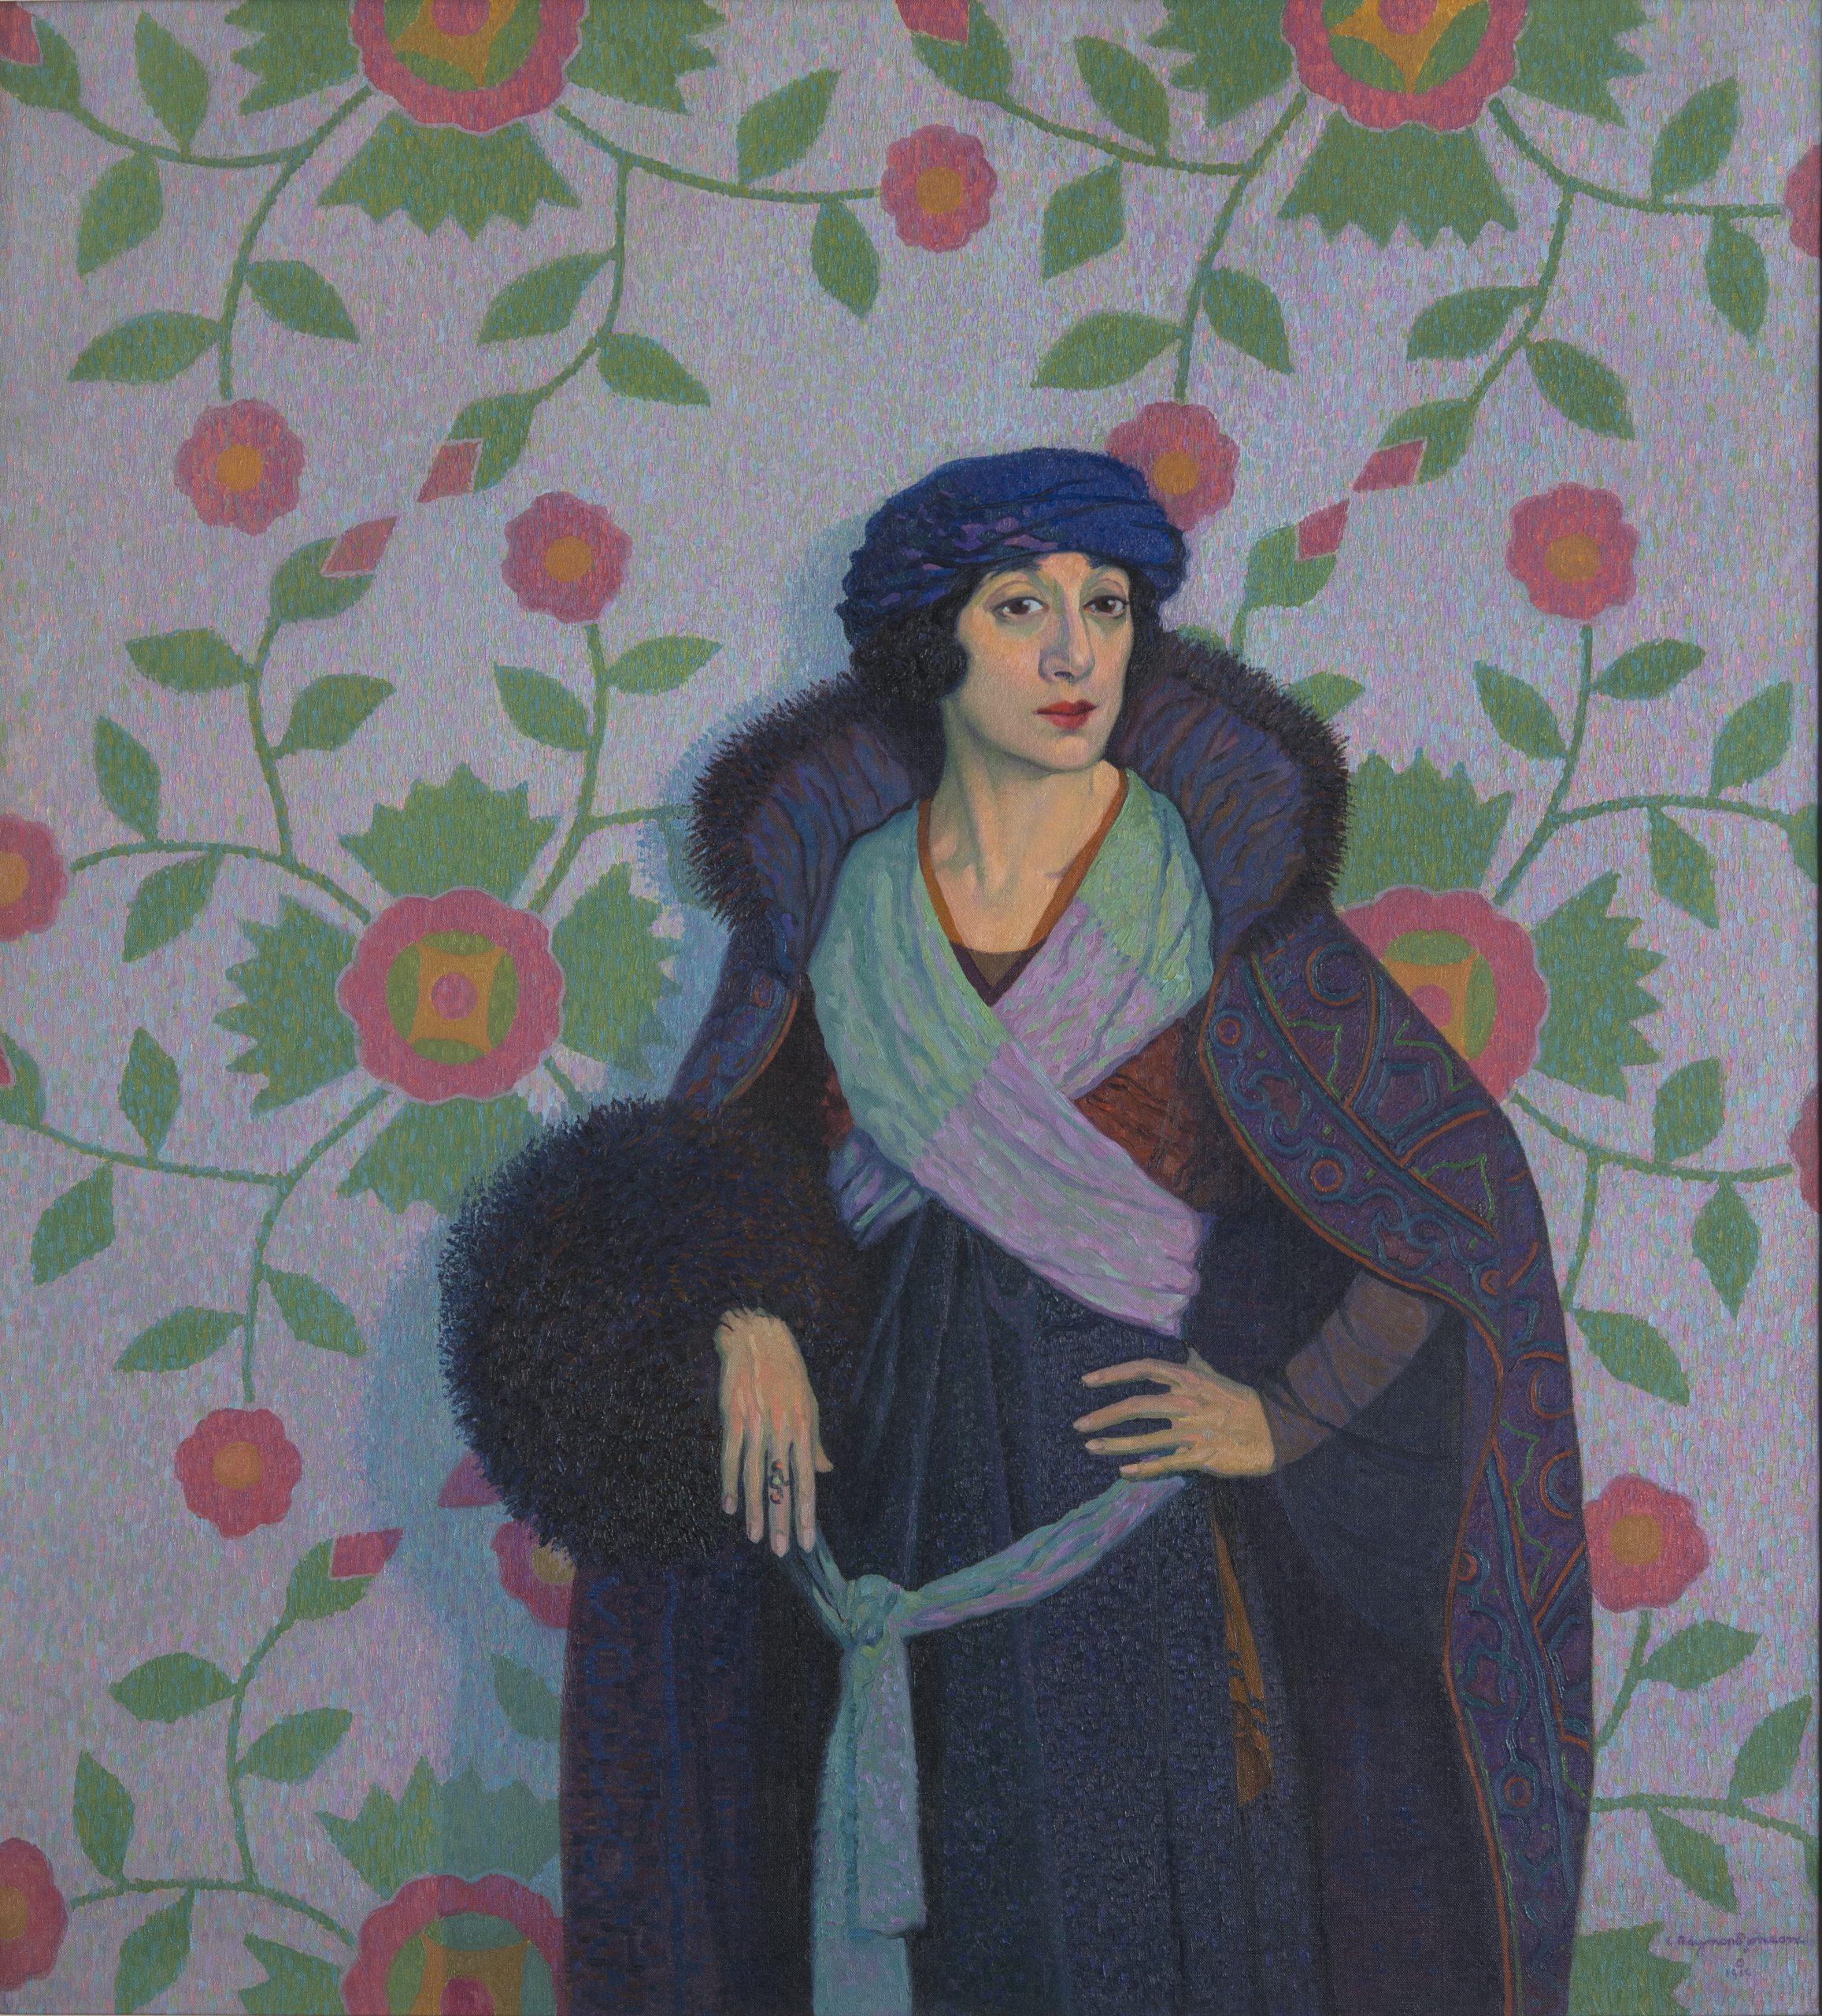 Miriam Kiper - A Characterization, 1919, Oil on canvas, Bequest of Raymond Jonson, Raymond Jonson Collection.